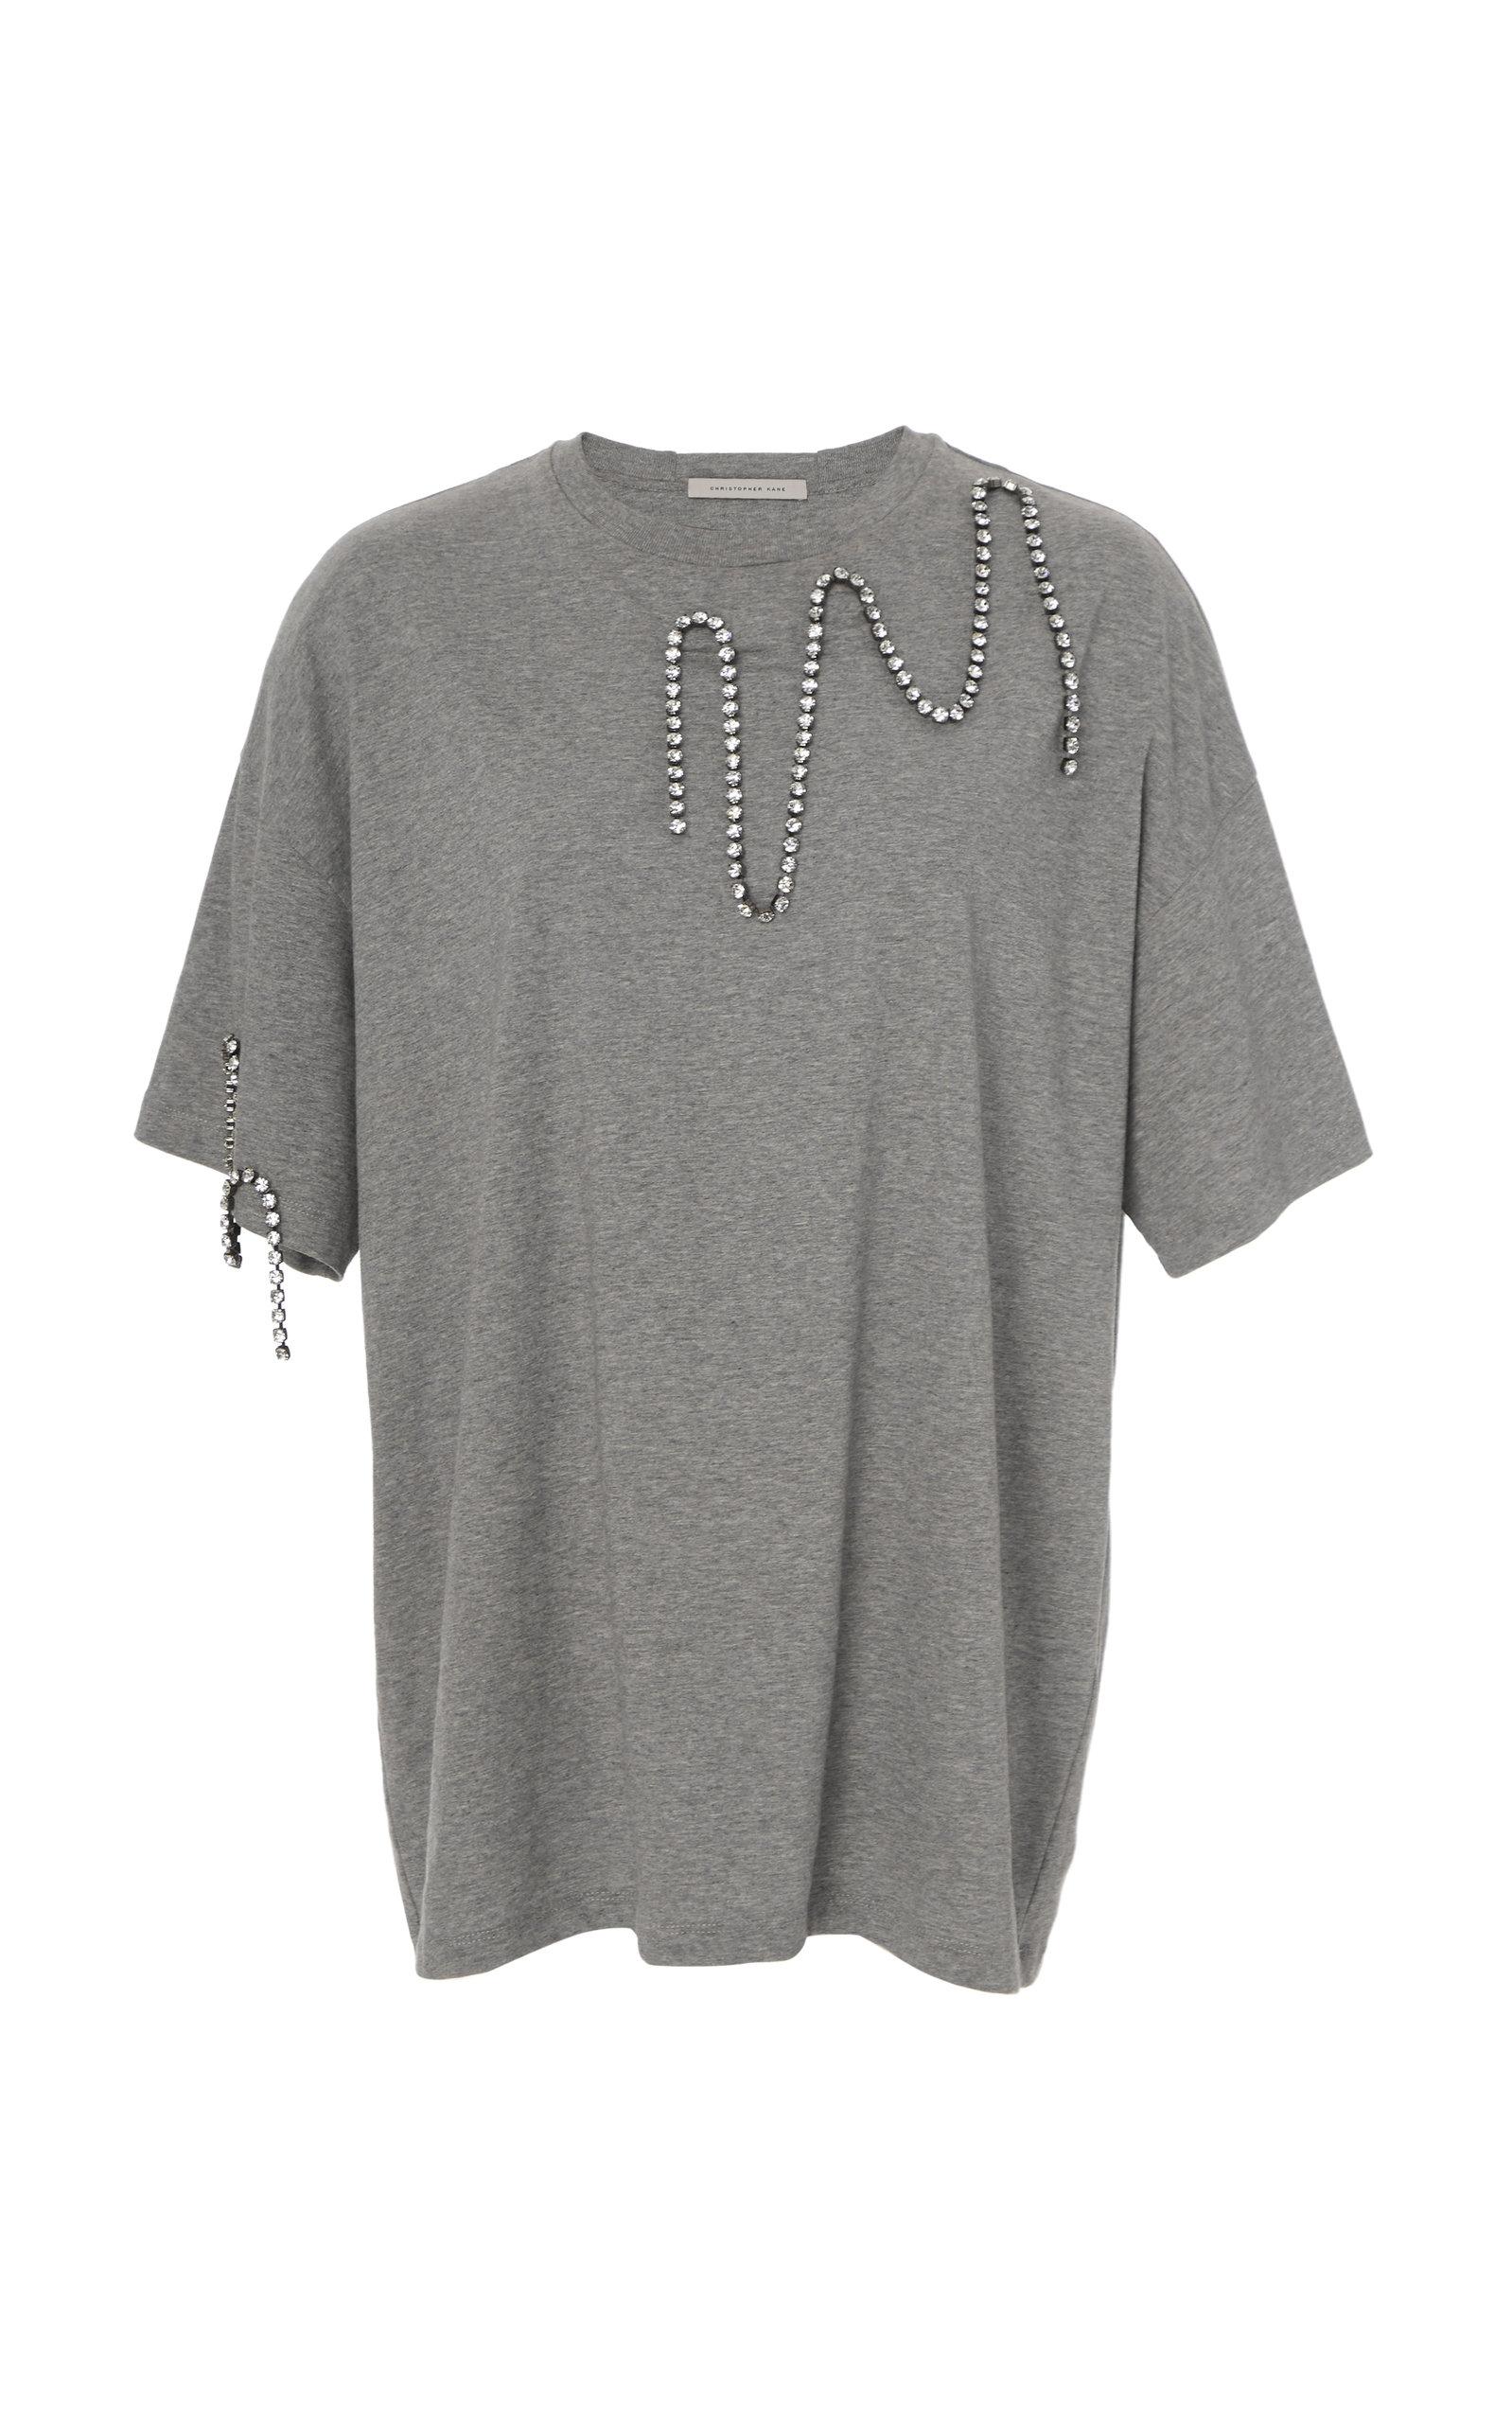 7e07bd92 Chain-Embellished Jersey T-Shirt by Christopher Kane   Moda Operandi